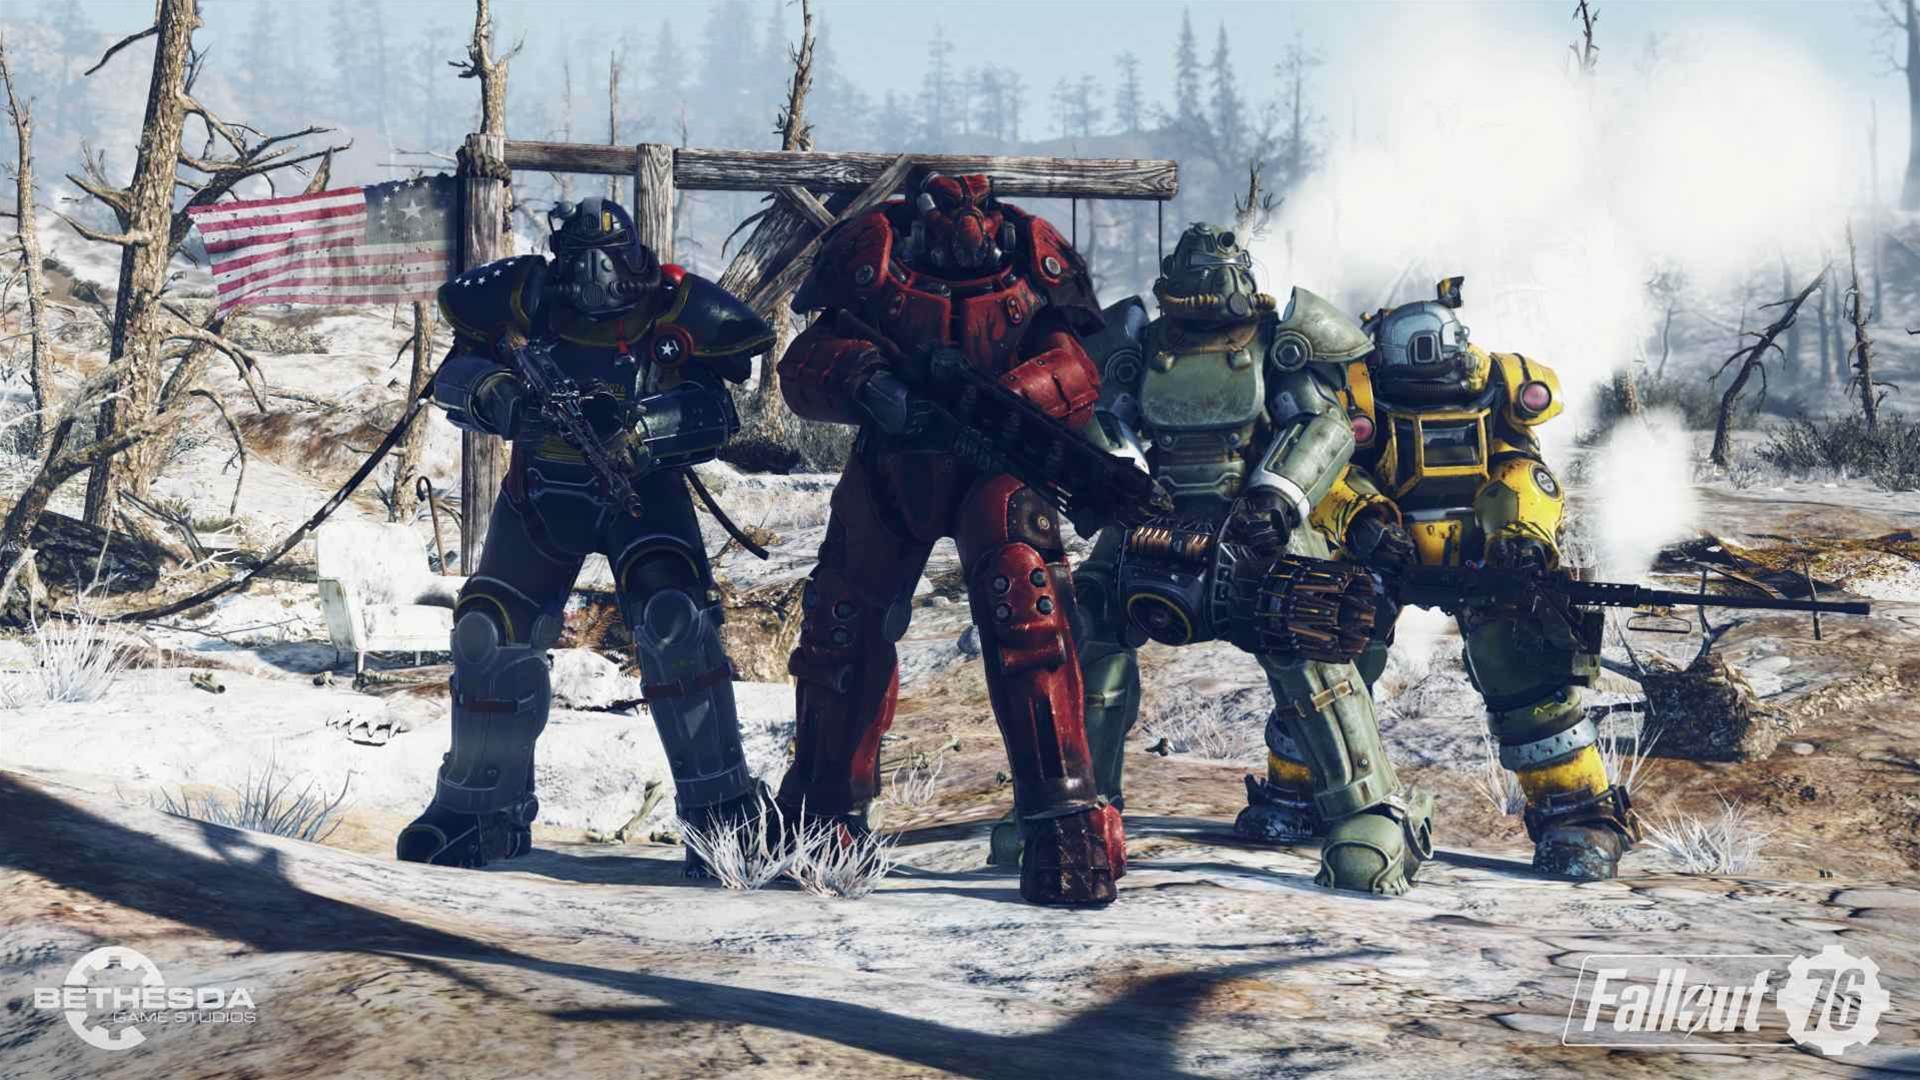 Fallout 76 E3 2018 screens